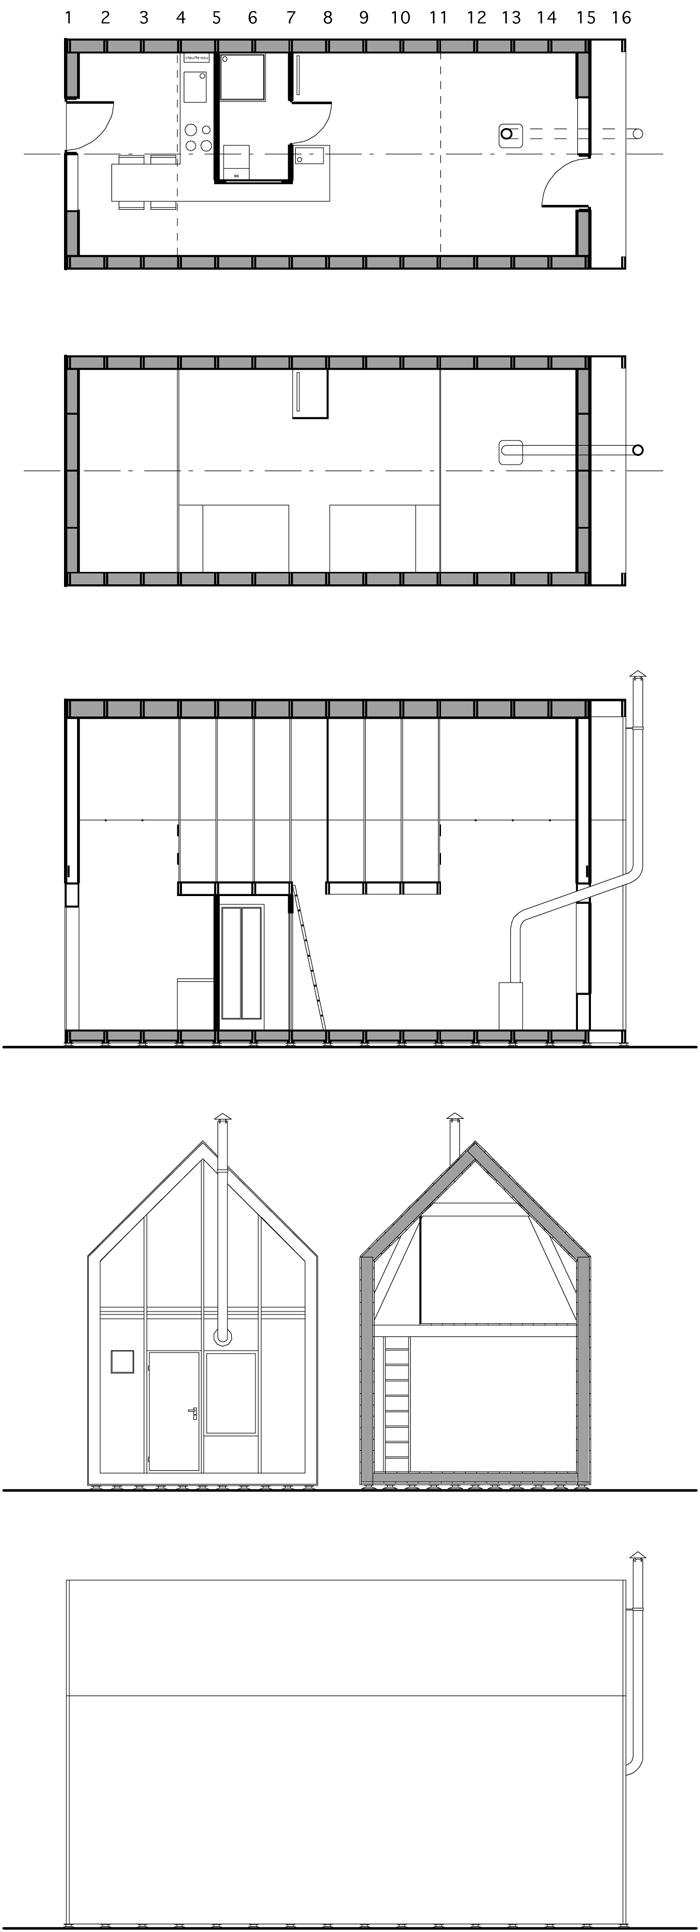 plans_ok_maison_20000Û